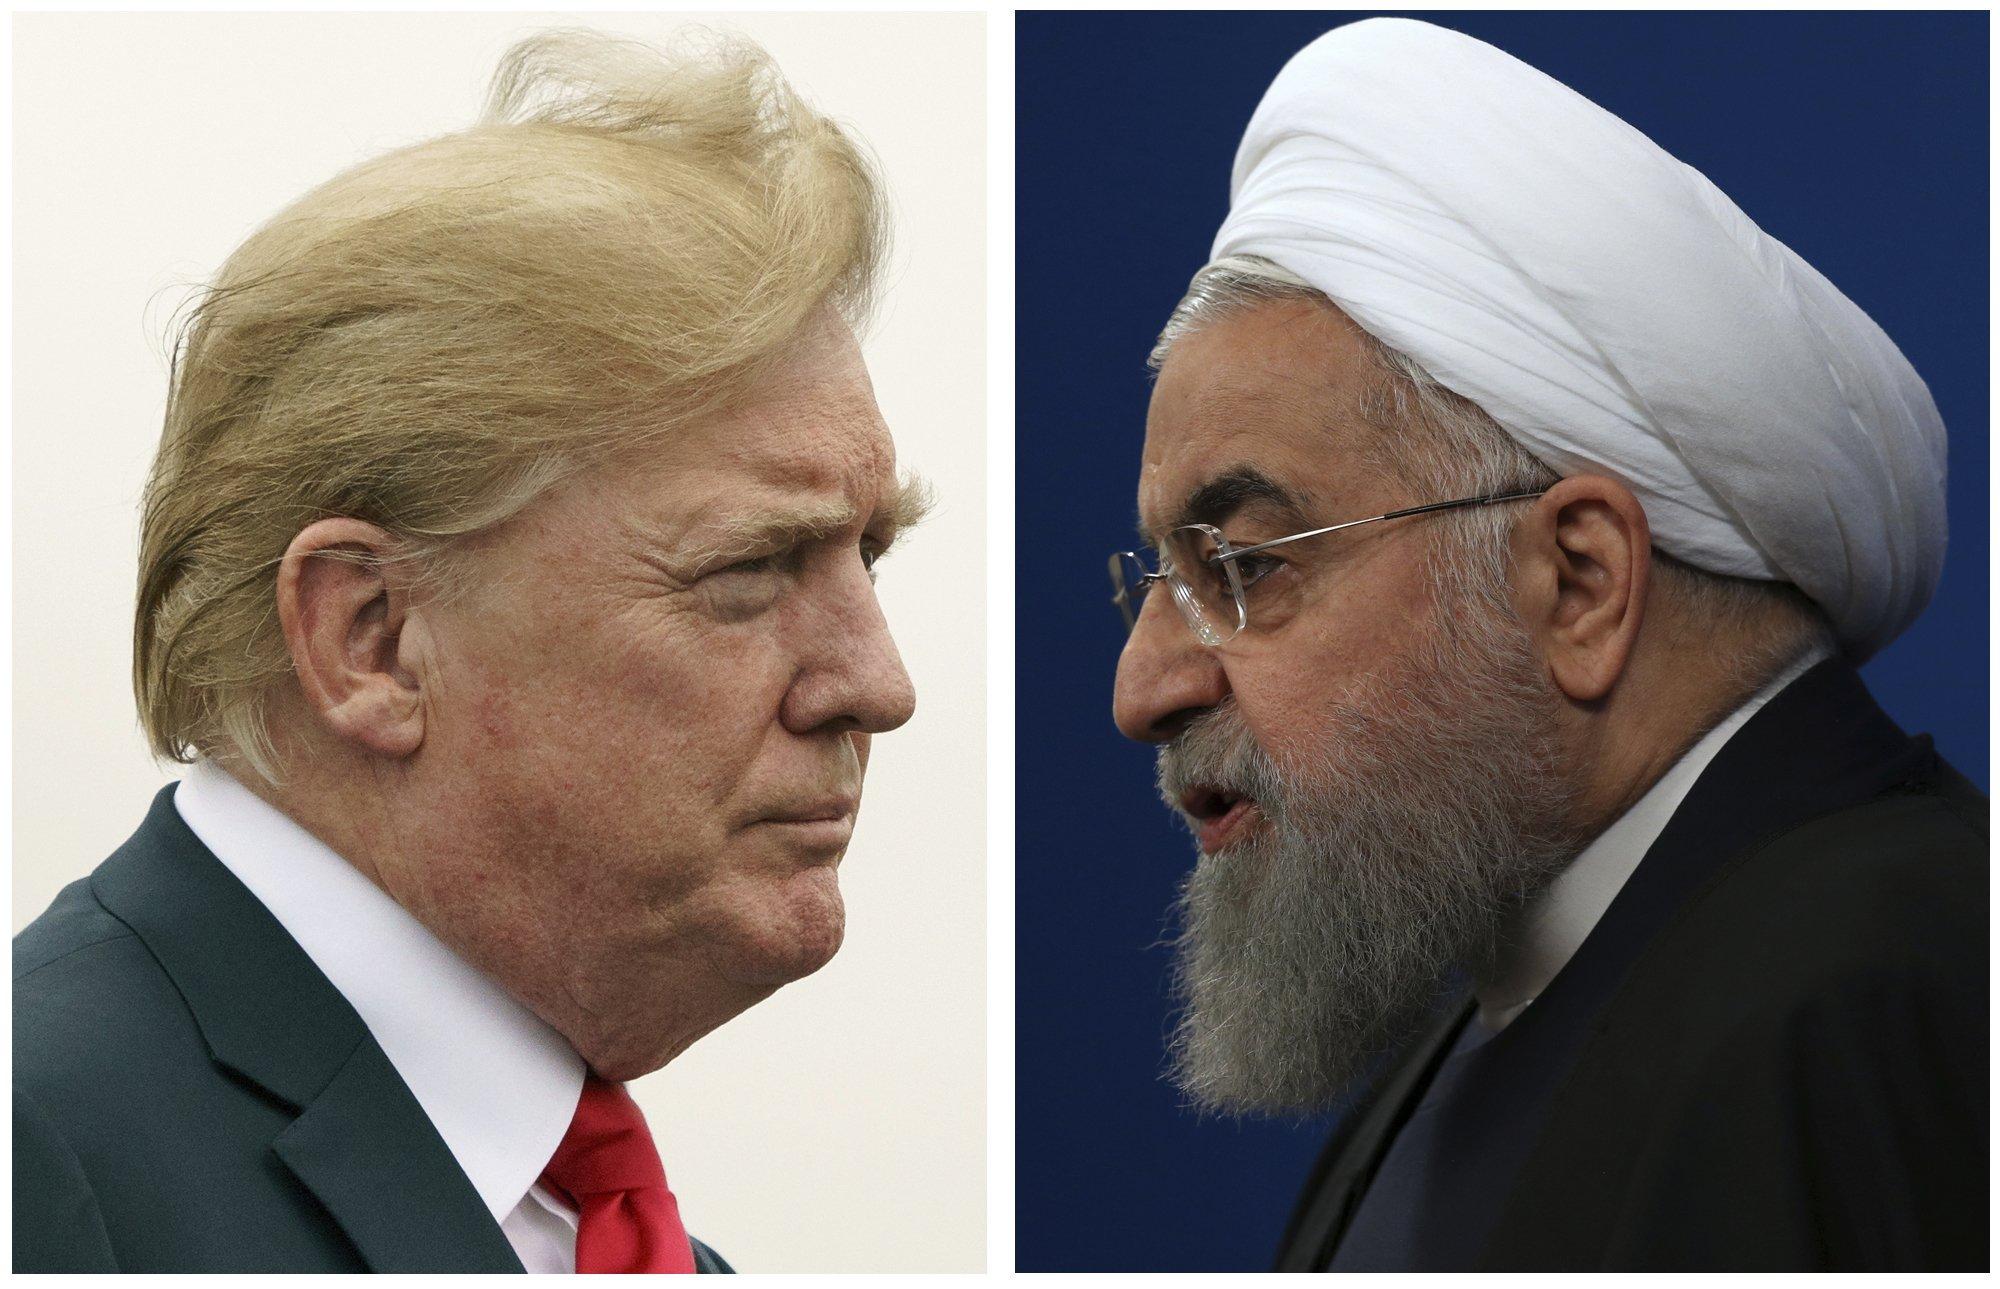 Just tough Trump tweeting? US ratchets up Iran pressure